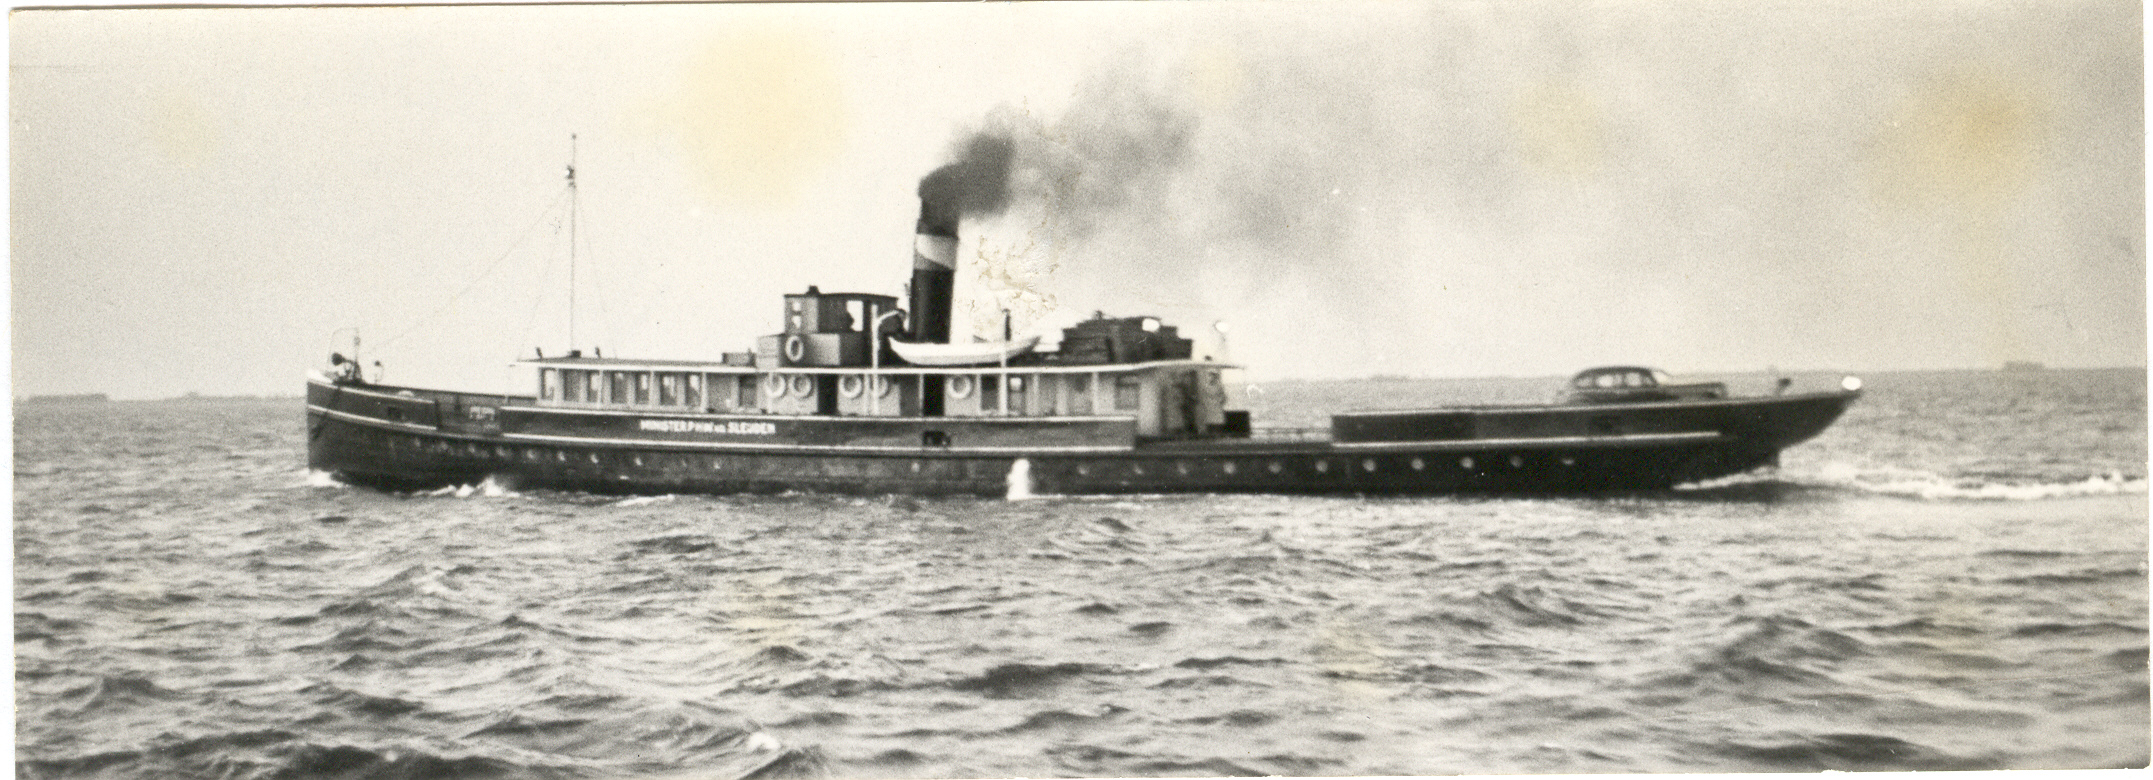 VeerbootRTM1